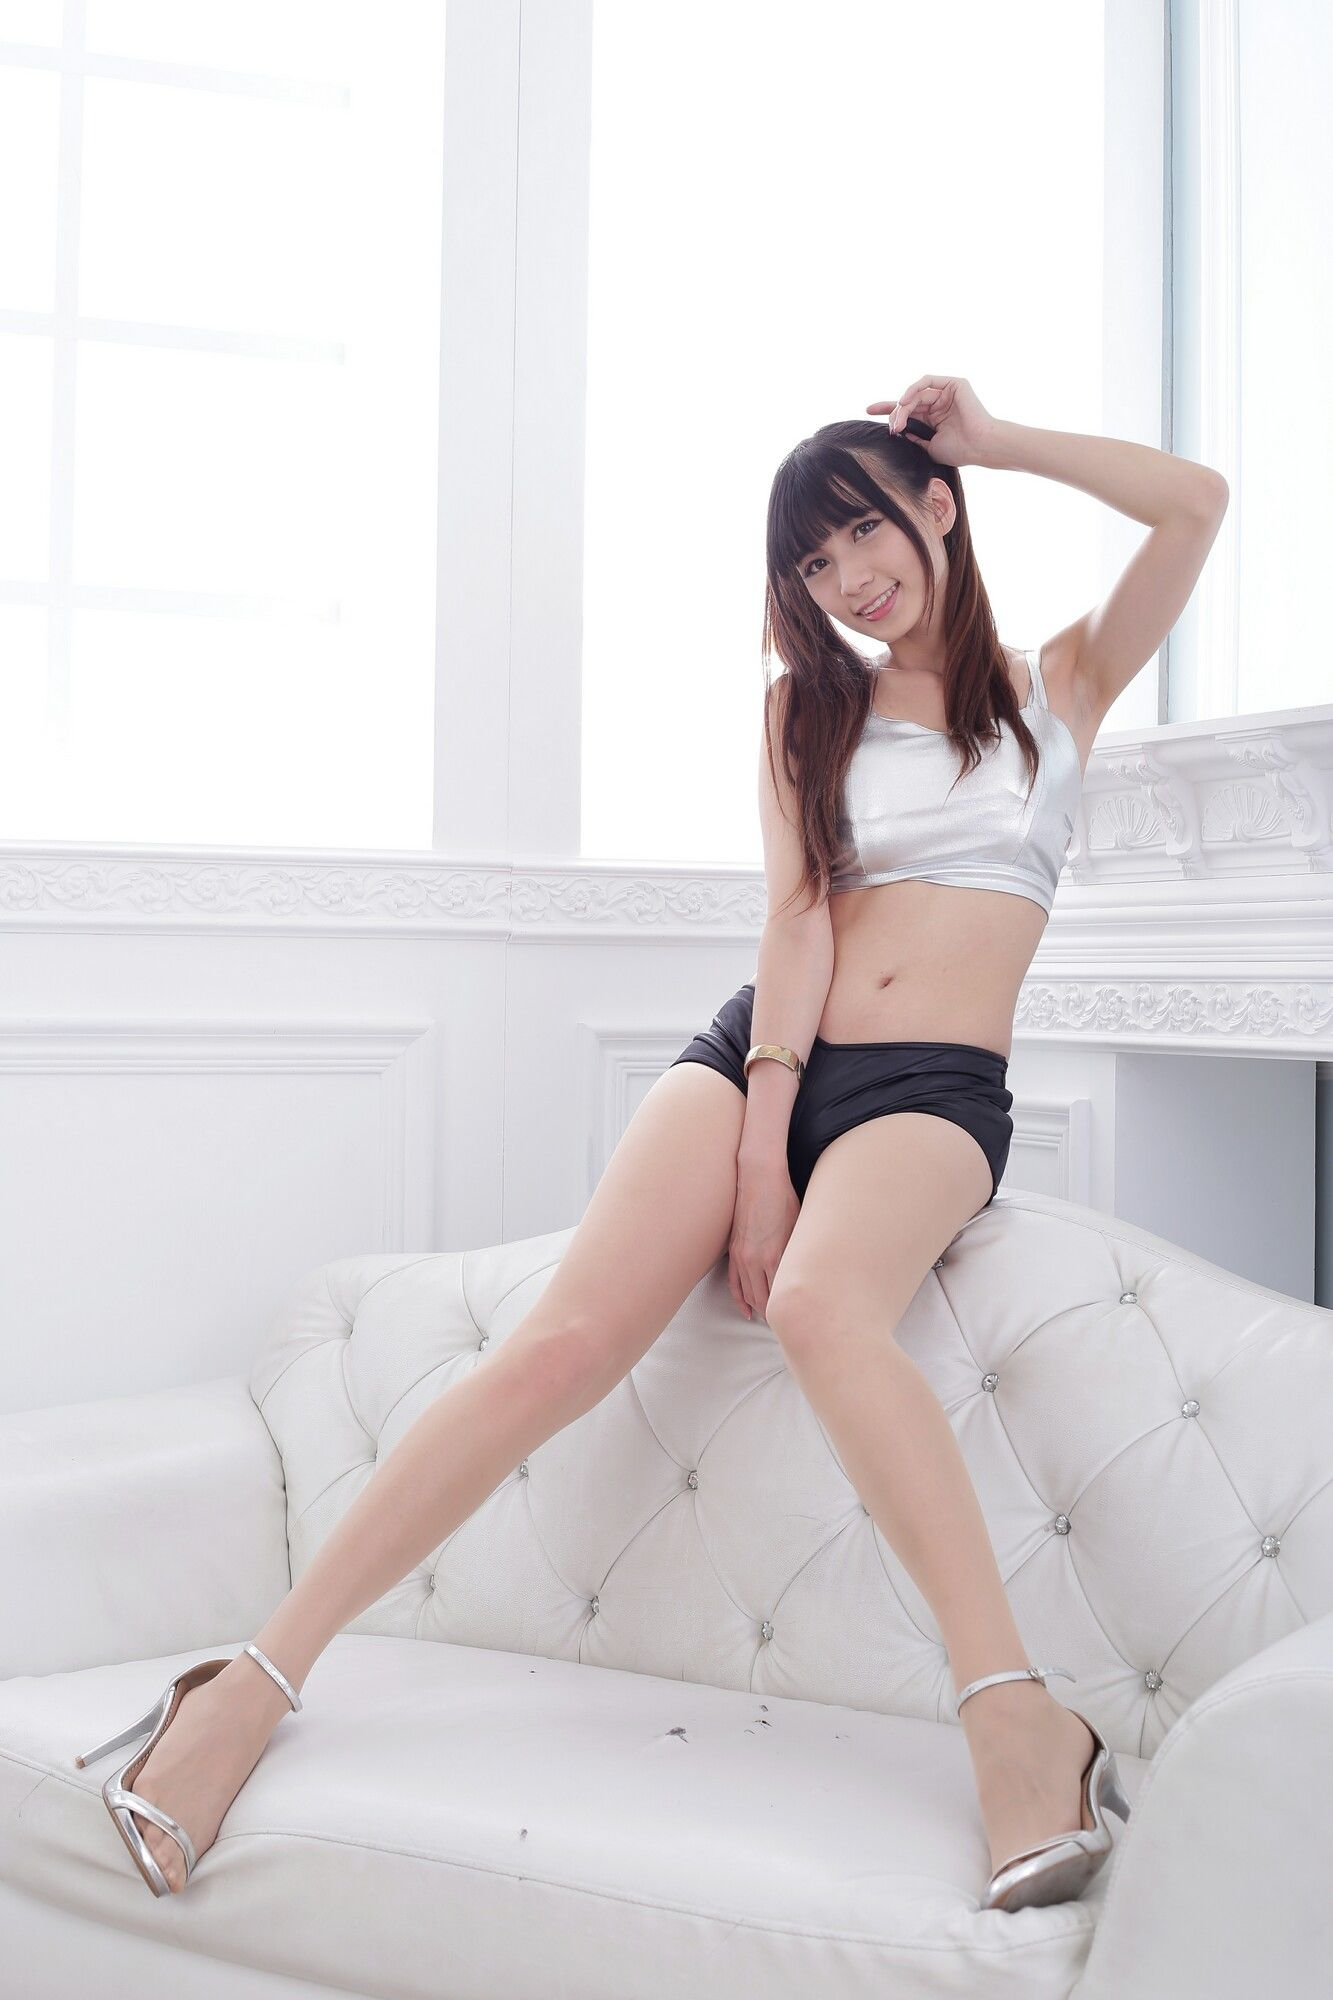 VOL.1601 [台湾正妹]热裤长腿美女双马尾:蔡译心(Candice)超高清个人性感漂亮大图(43P)